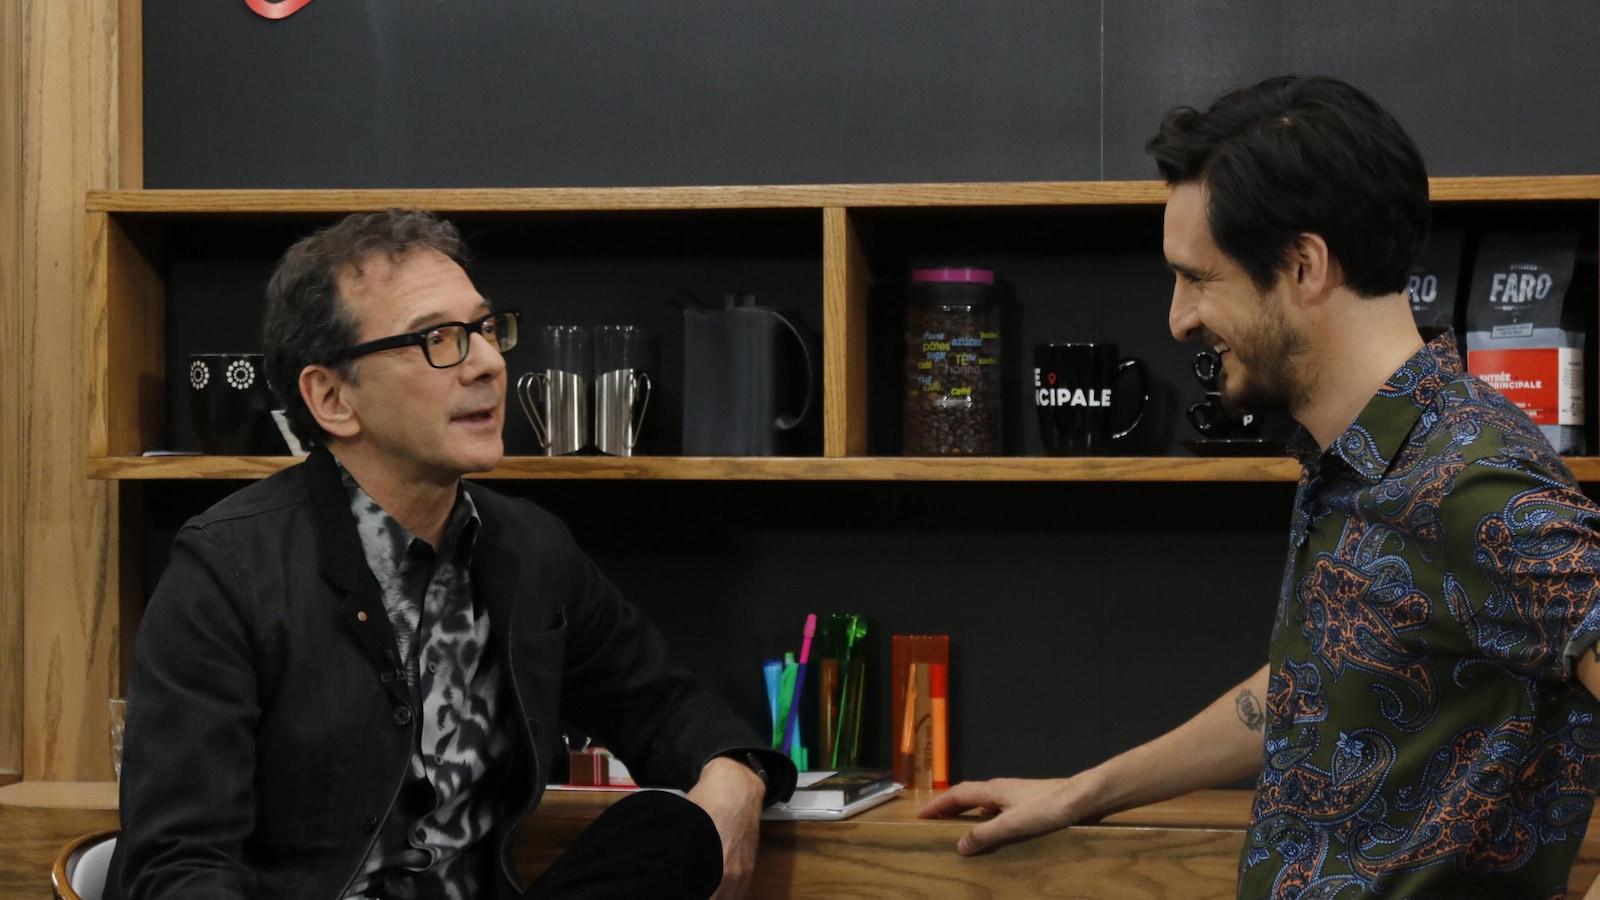 Roger Simard et Sébasten Diaz